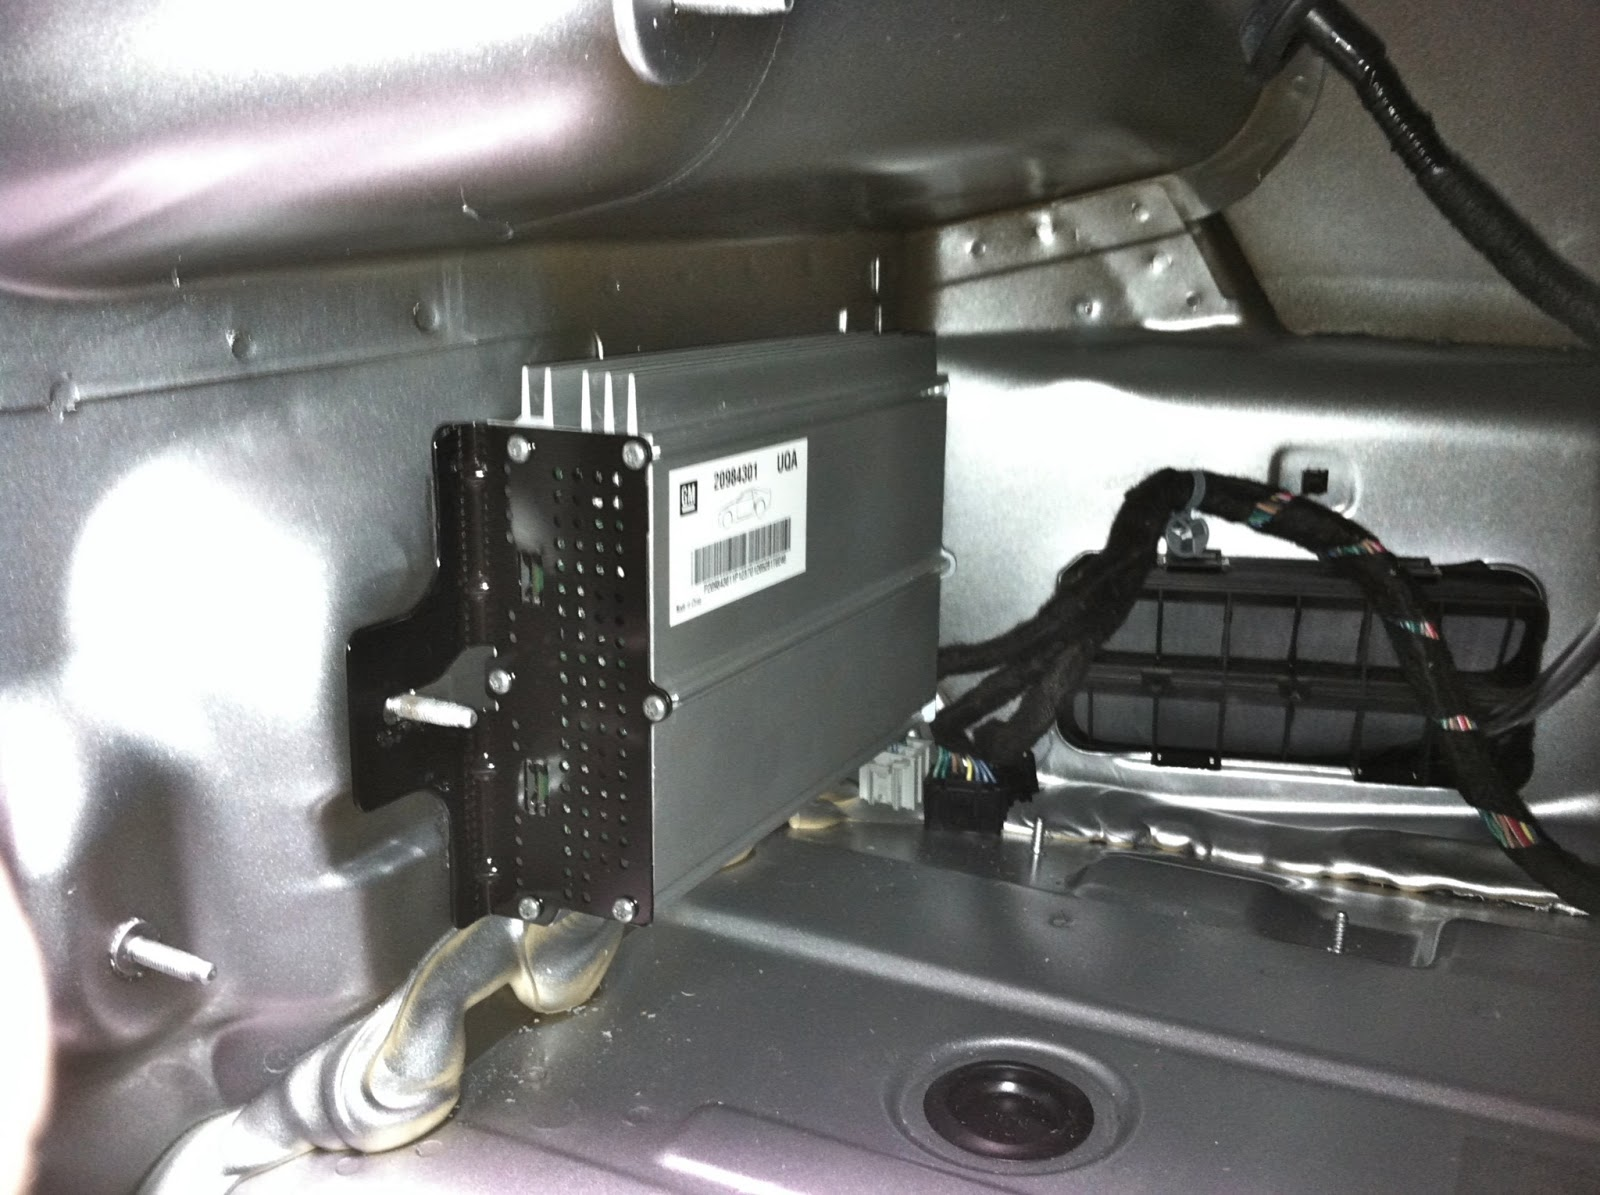 2010 Camaro Boston Acoustics Amp Wiring Diagram